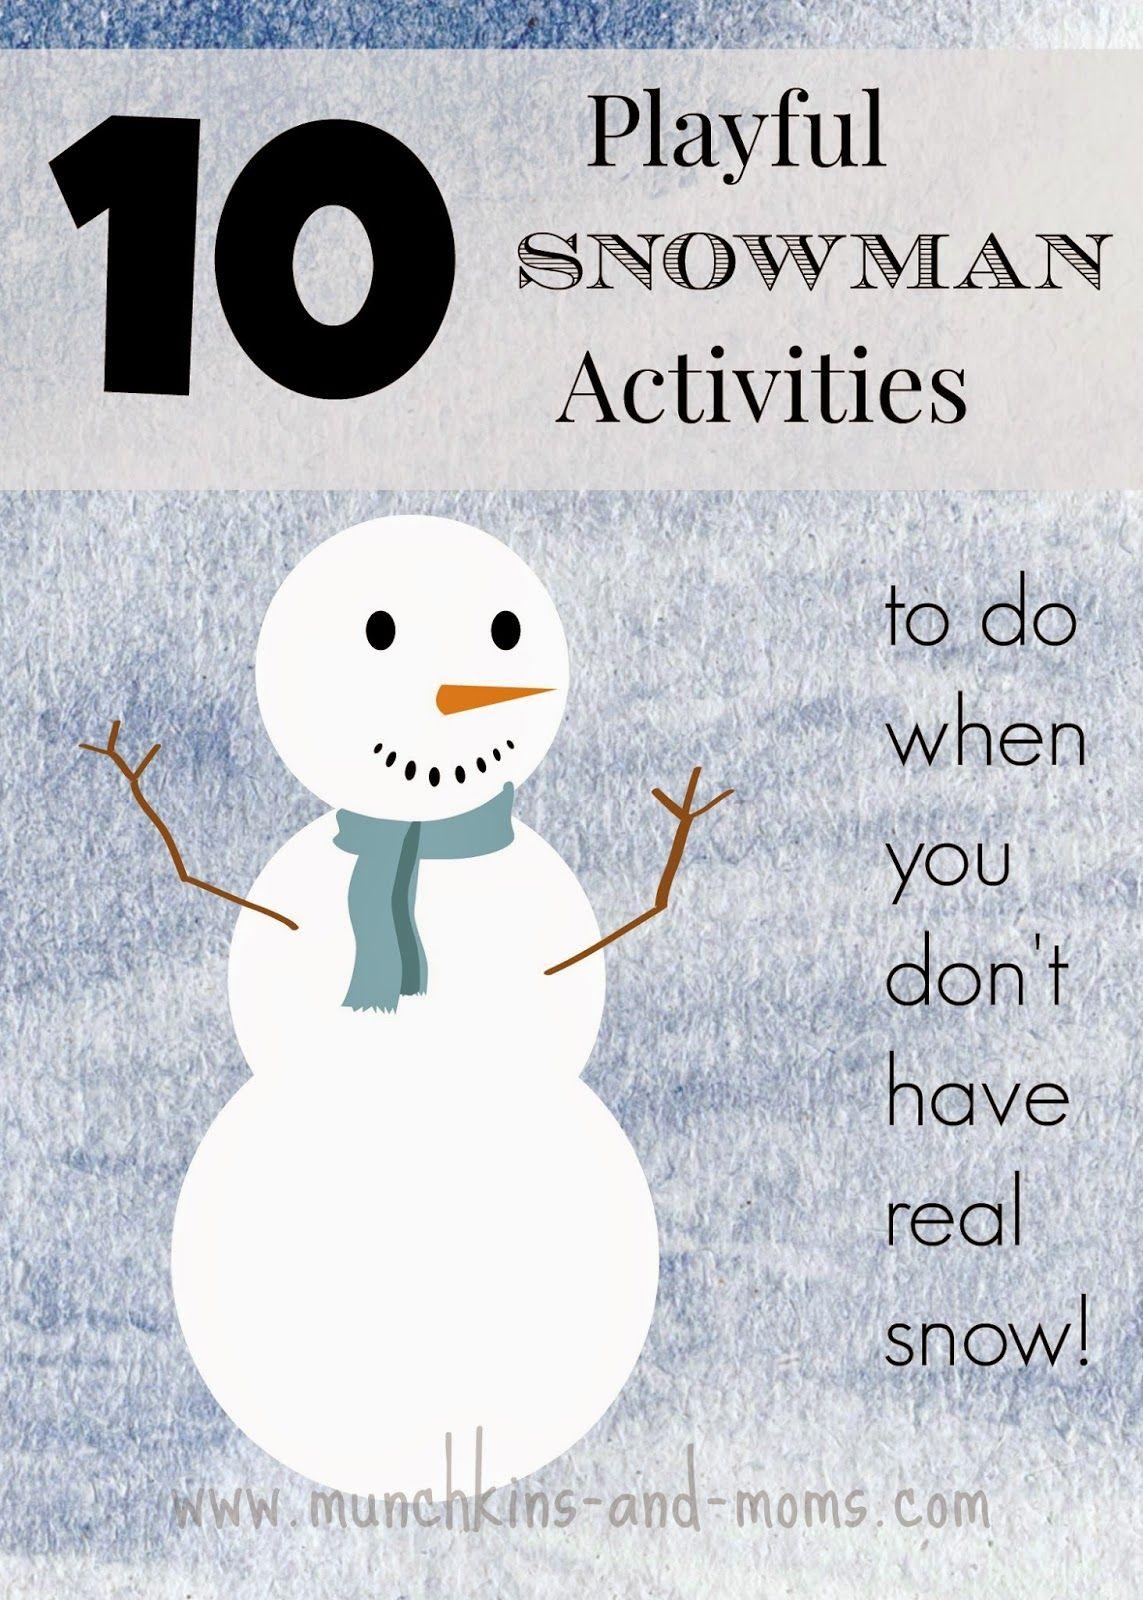 10 Playful Snowman Activities And A Mega Cash Giveaway